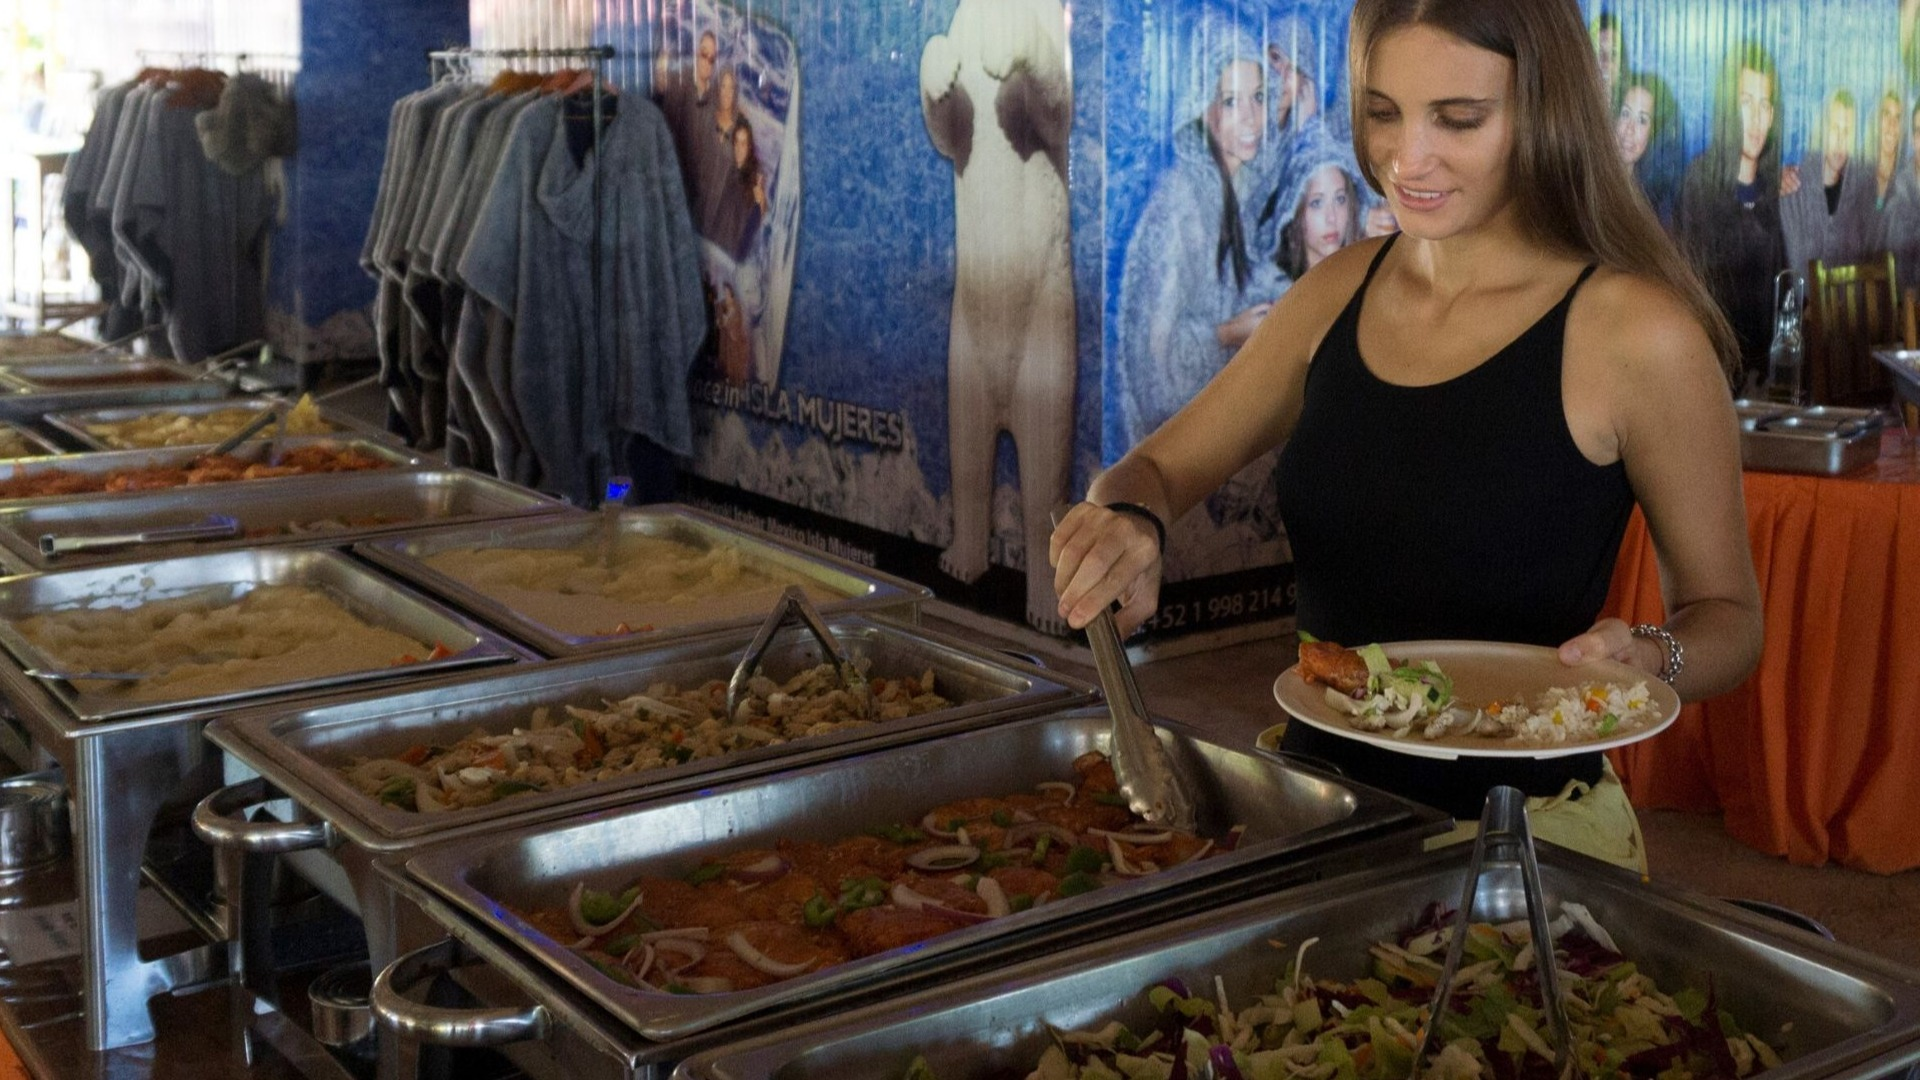 07 - Beach club - Playa Mexico - Ice Bar Isla Mujeres - Beach relaxing - Buffet food